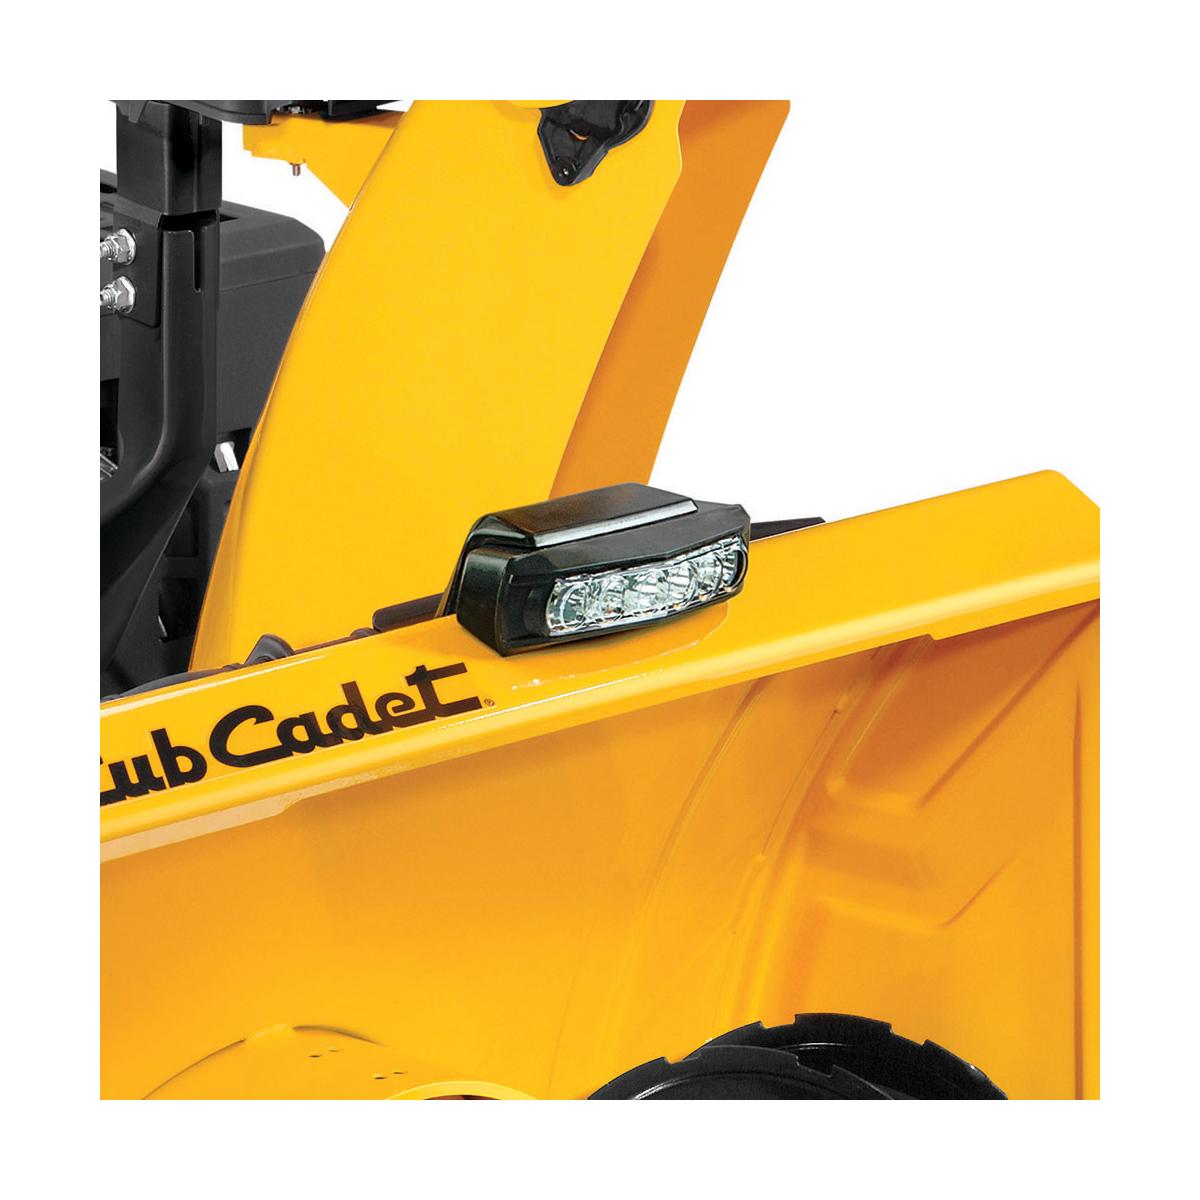 Cub Cadet Led Light Bar Kit 753-08484 | Power Mower Sales